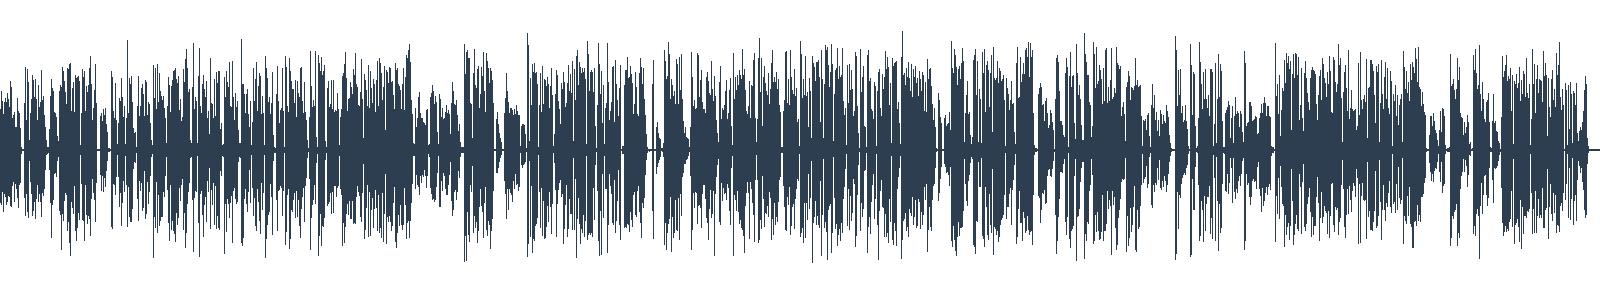 Pippi Dlhá pančucha (audiokniha) - ukážka waveform